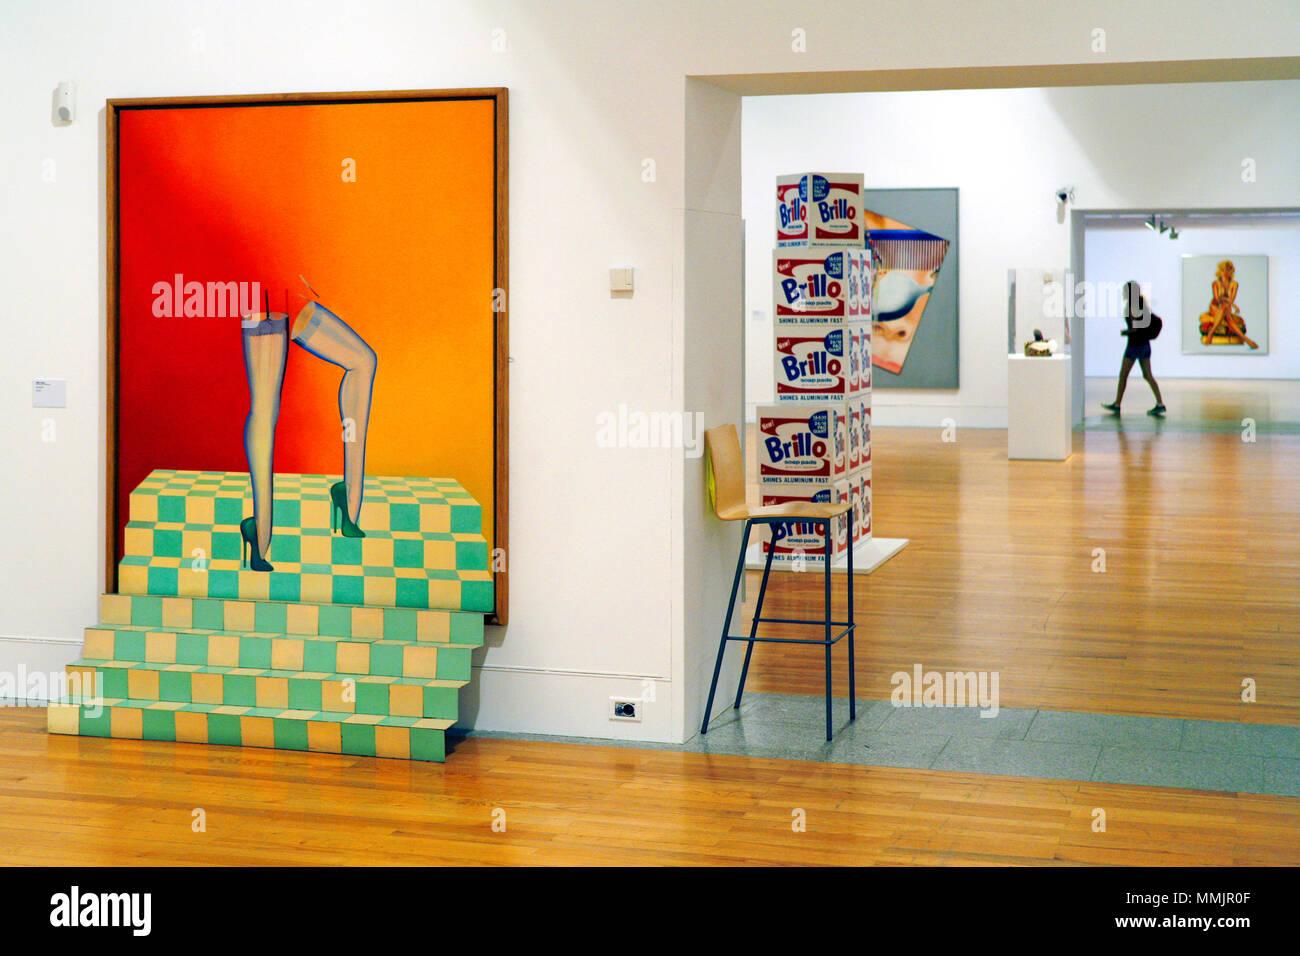 La Sheer (left) by Allen Jones & Brillo Soap Pads Boxes by Andy Warhol, Museu Colecção Berardo / Berardo Collection Museum, Belém, Lisbon, Portugal - Stock Image